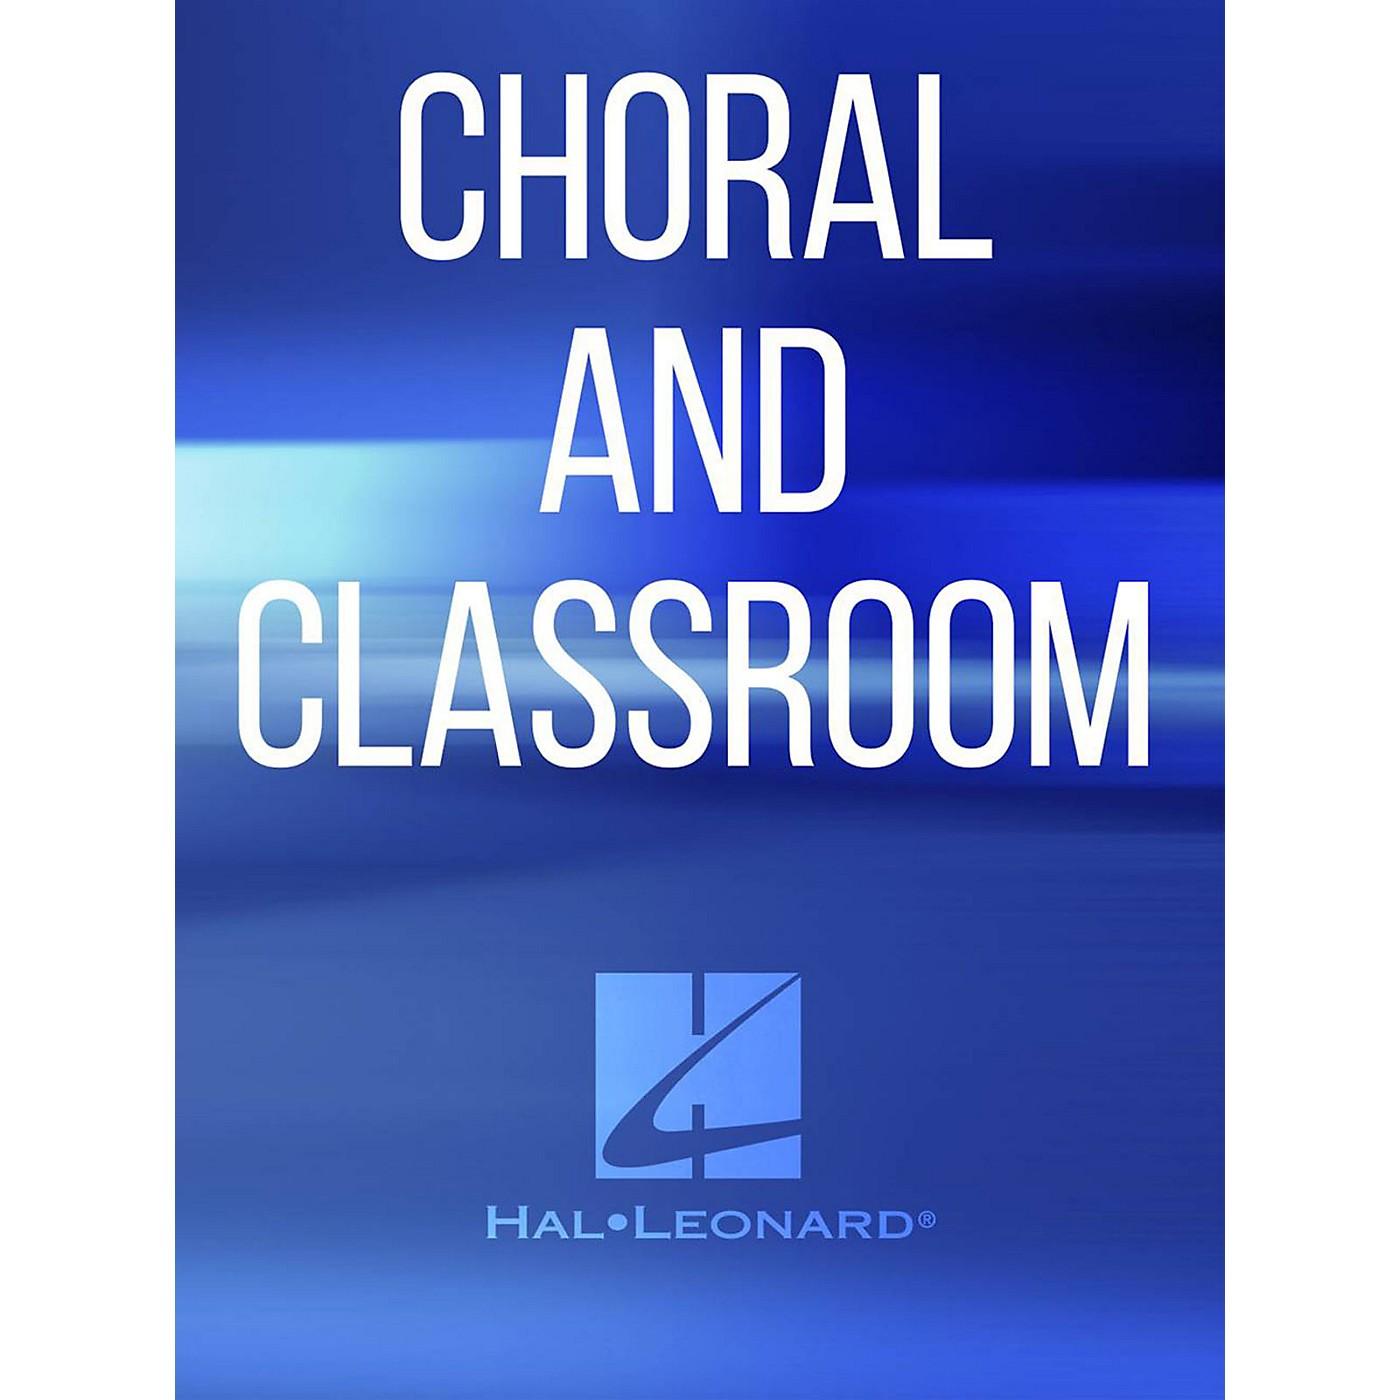 Hal Leonard Lost in the Fifties Tonight (Medley) ShowTrax CD Arranged by Ed Lojeski thumbnail